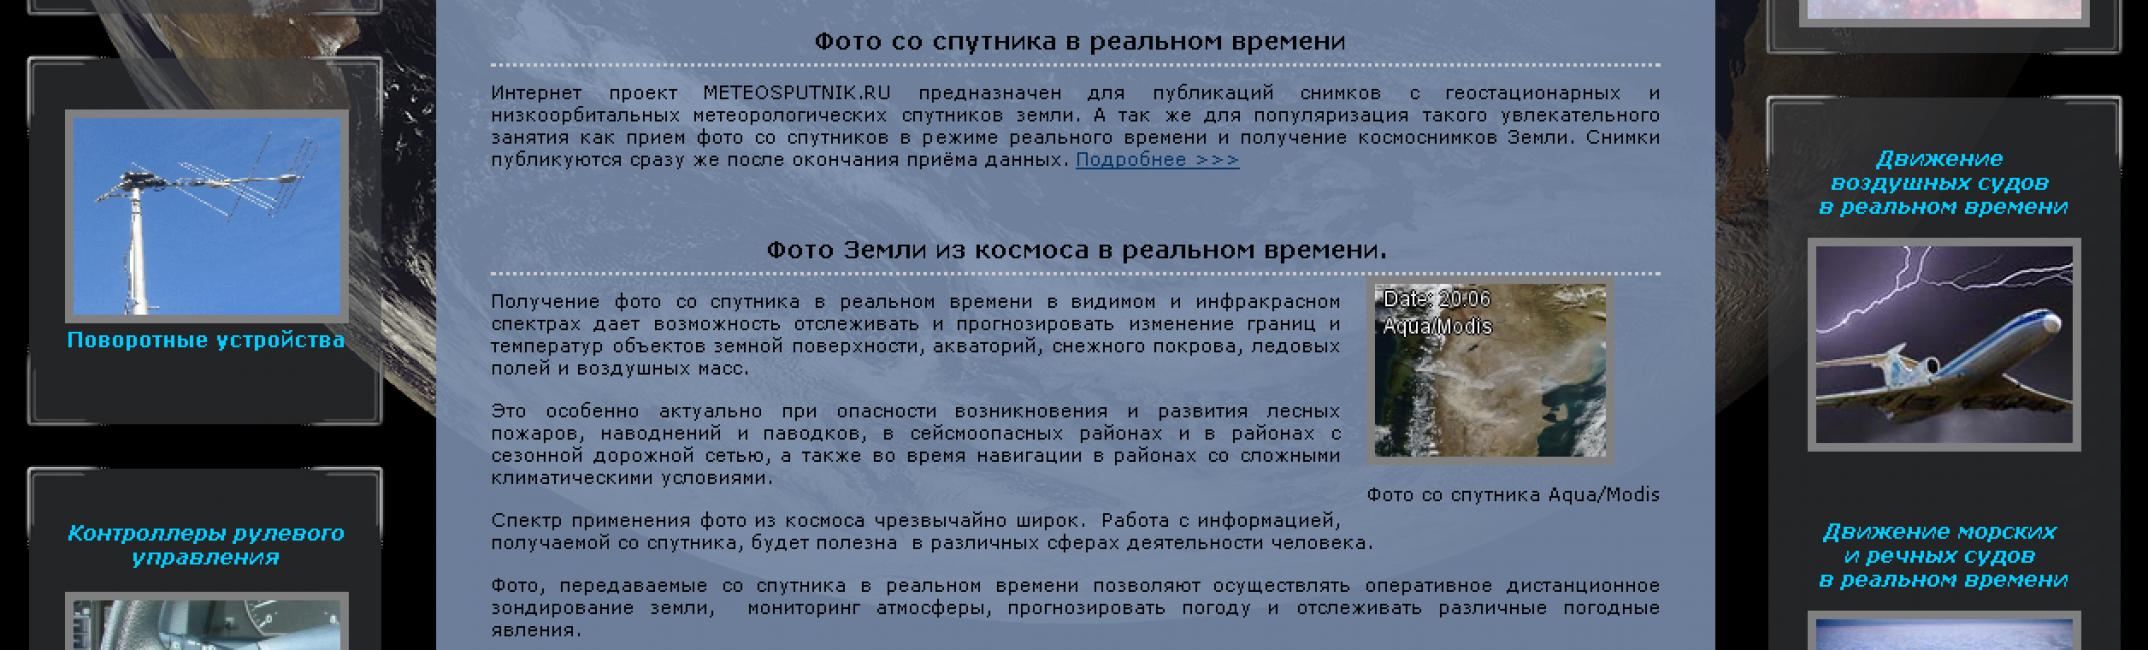 meteosputnik.ru